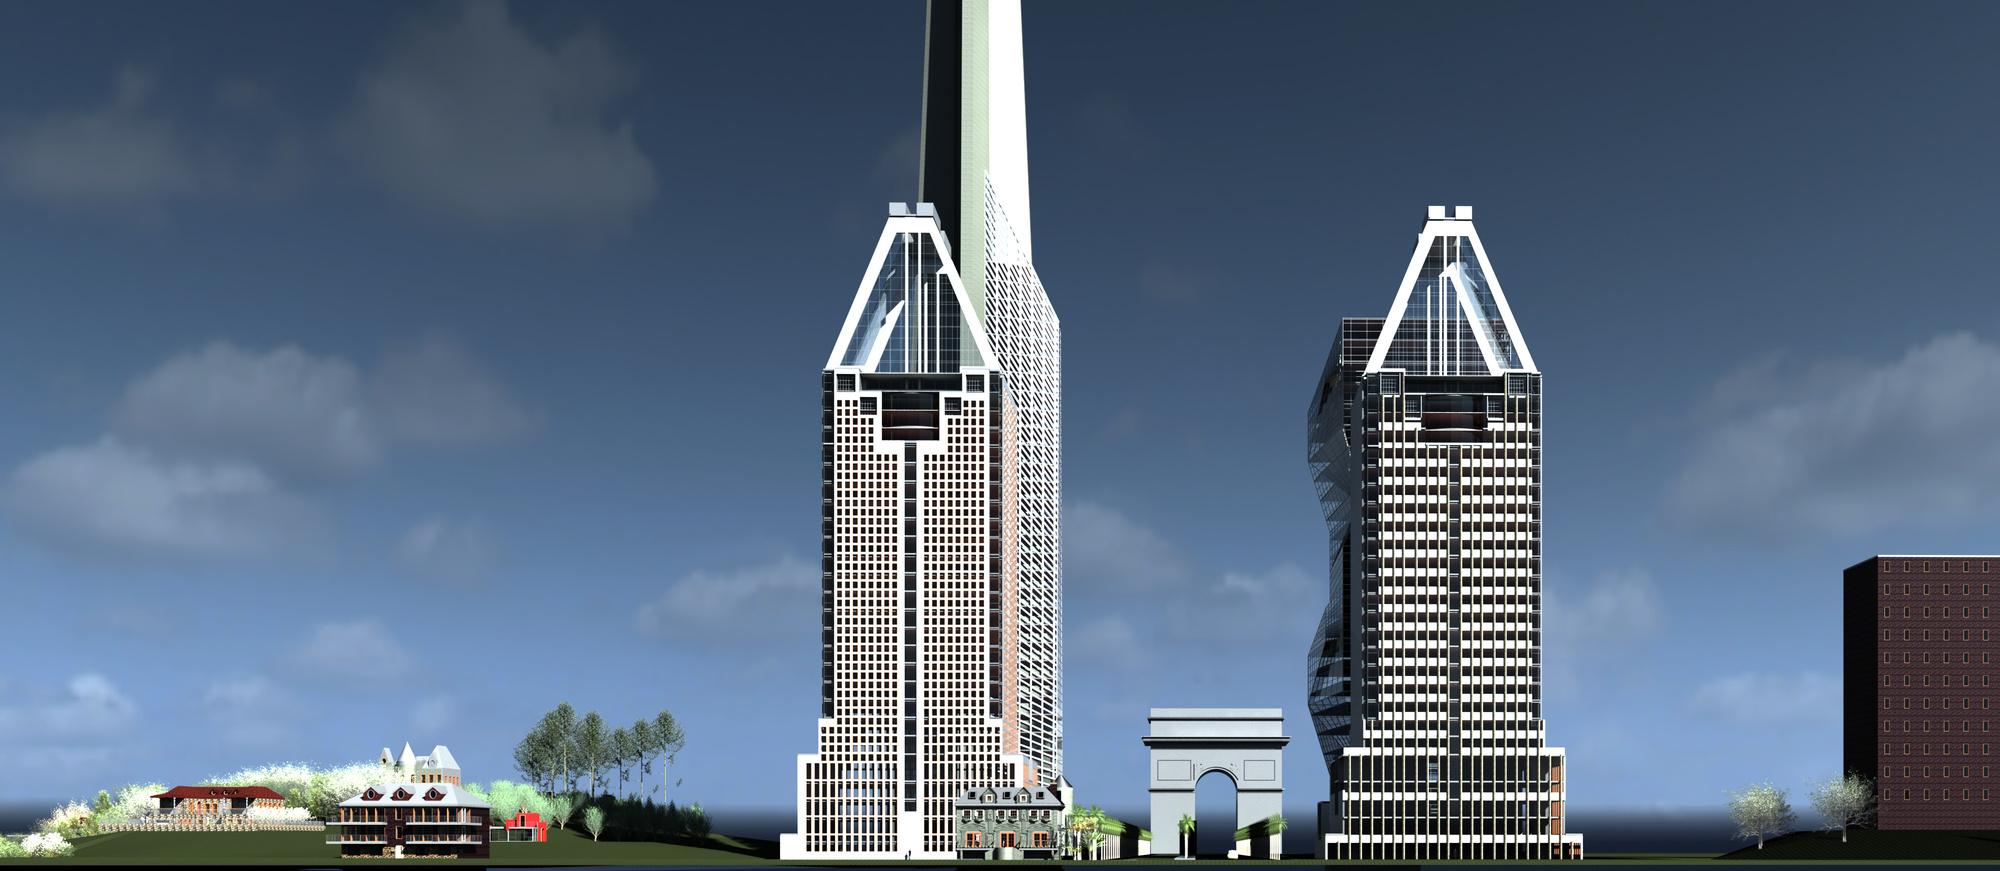 Raas-rendering20150212-4275-kvl12v